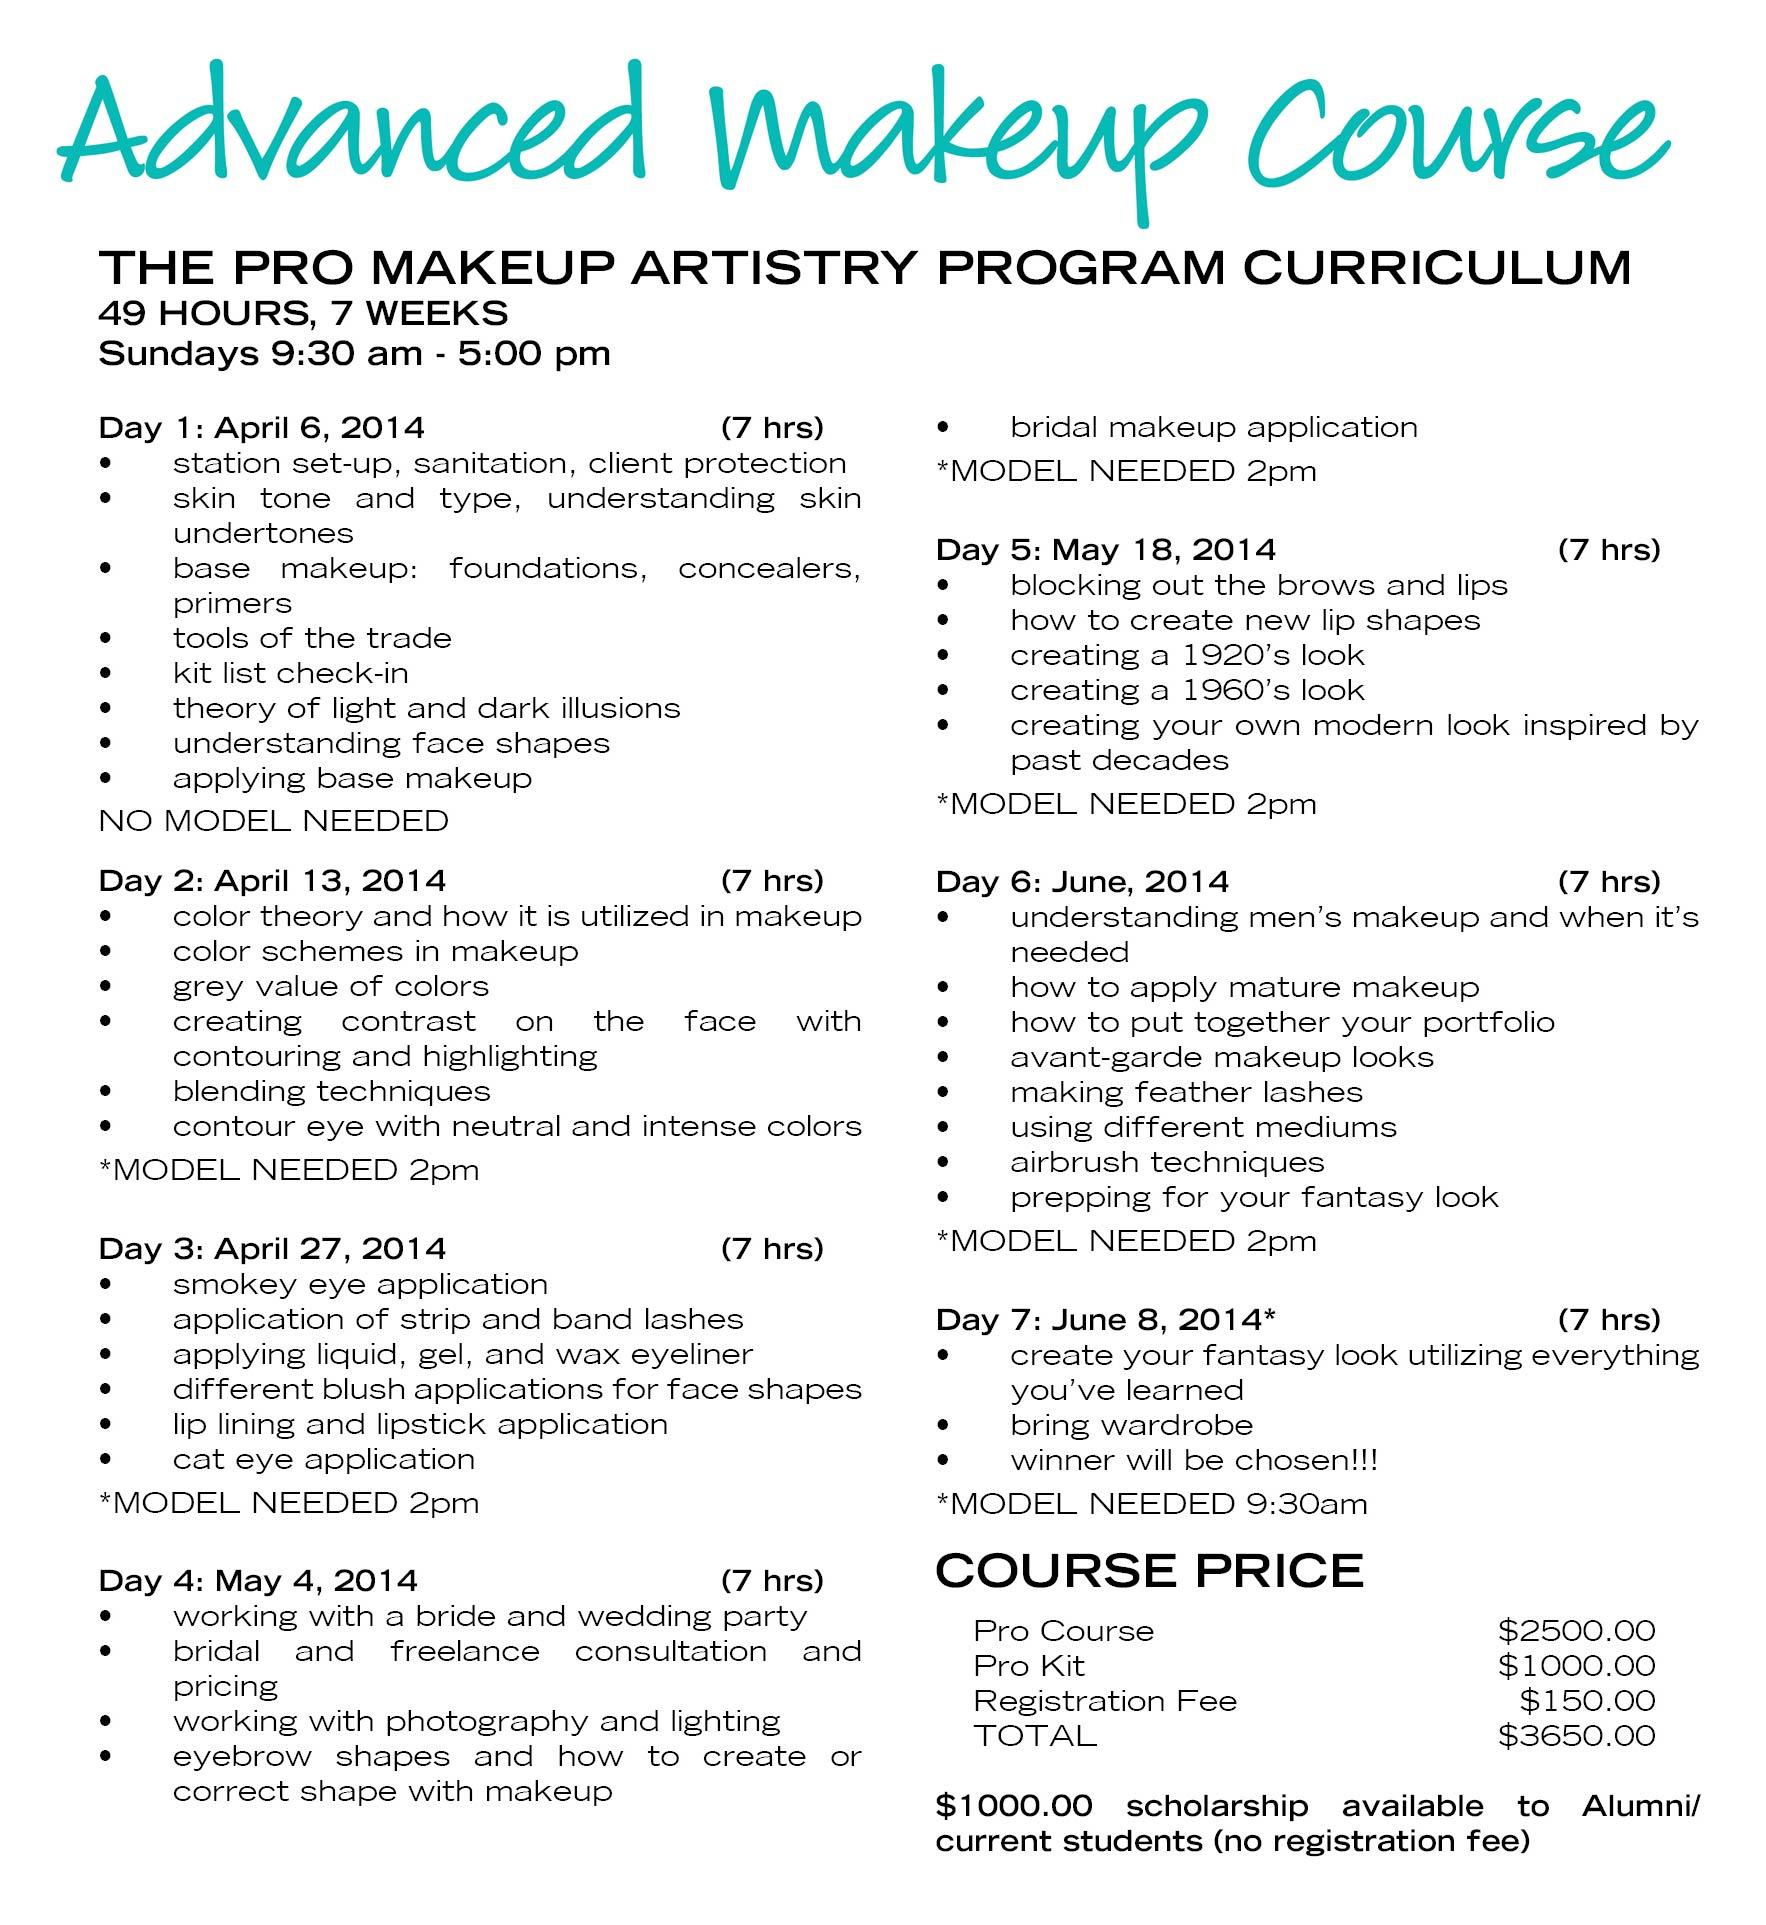 Makeup-consultation-form - Makeup Ideas